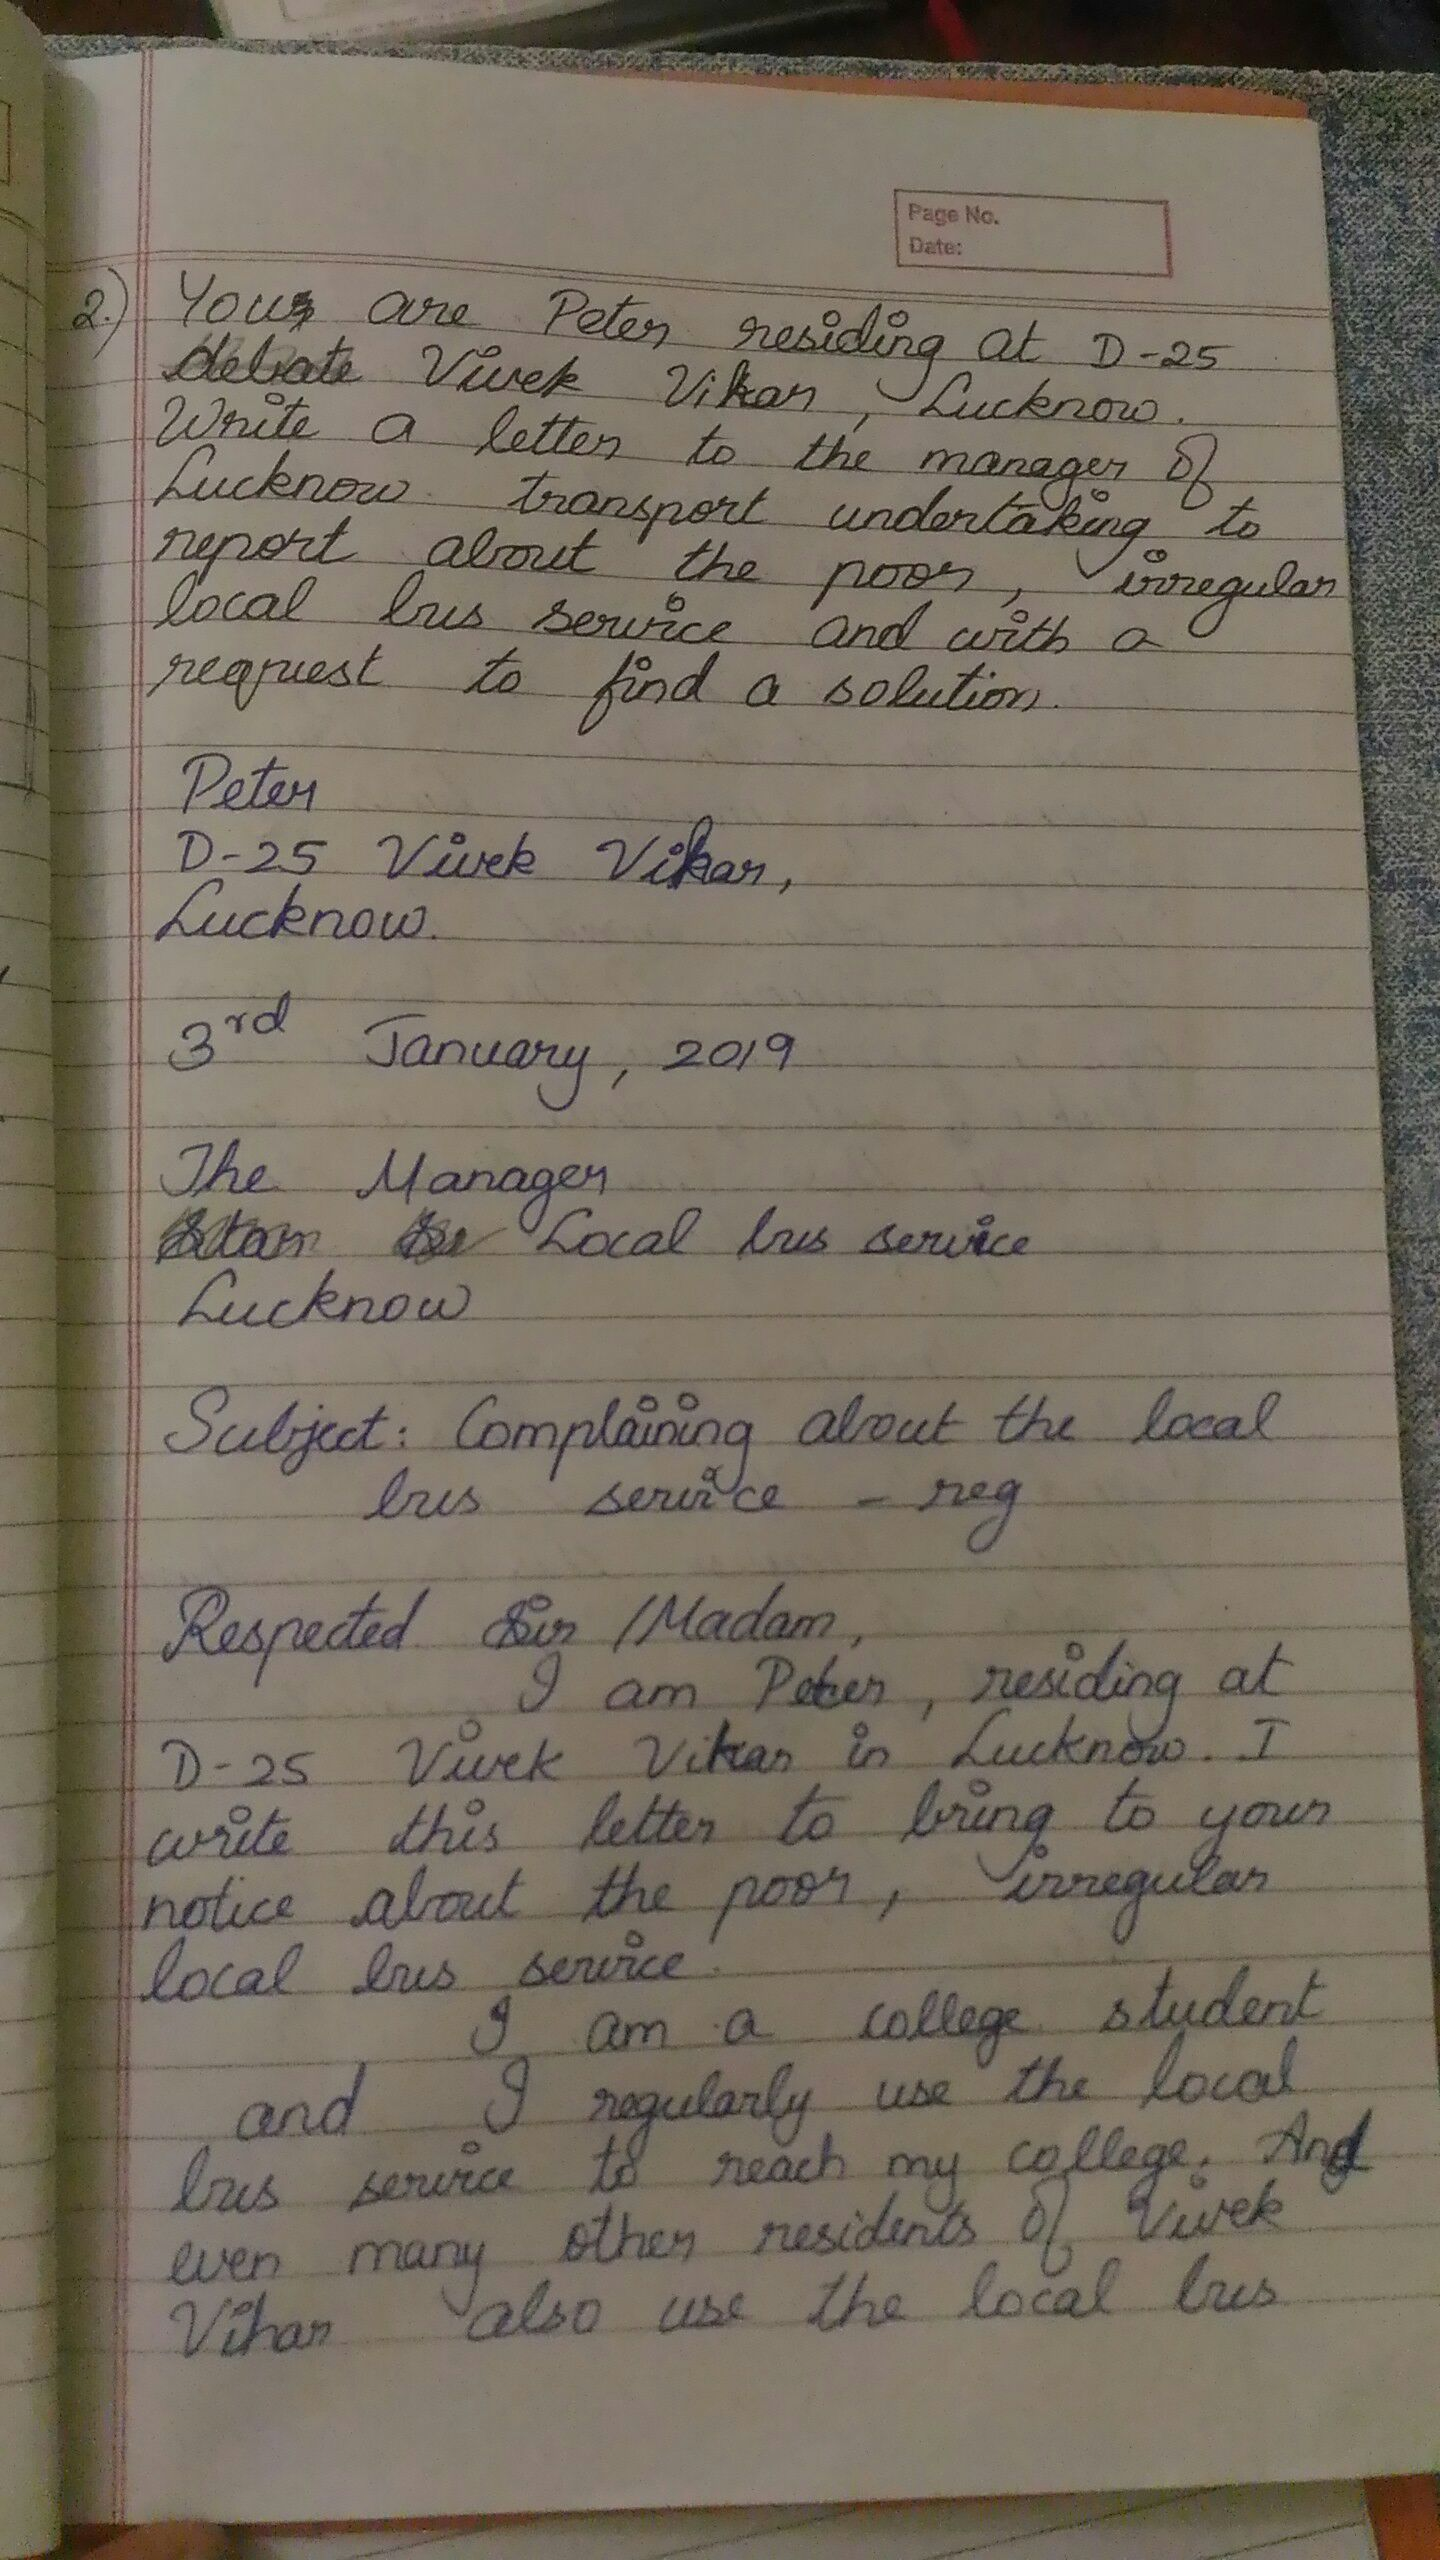 you are Peter residing at d 25 vivek vihar  write a letter